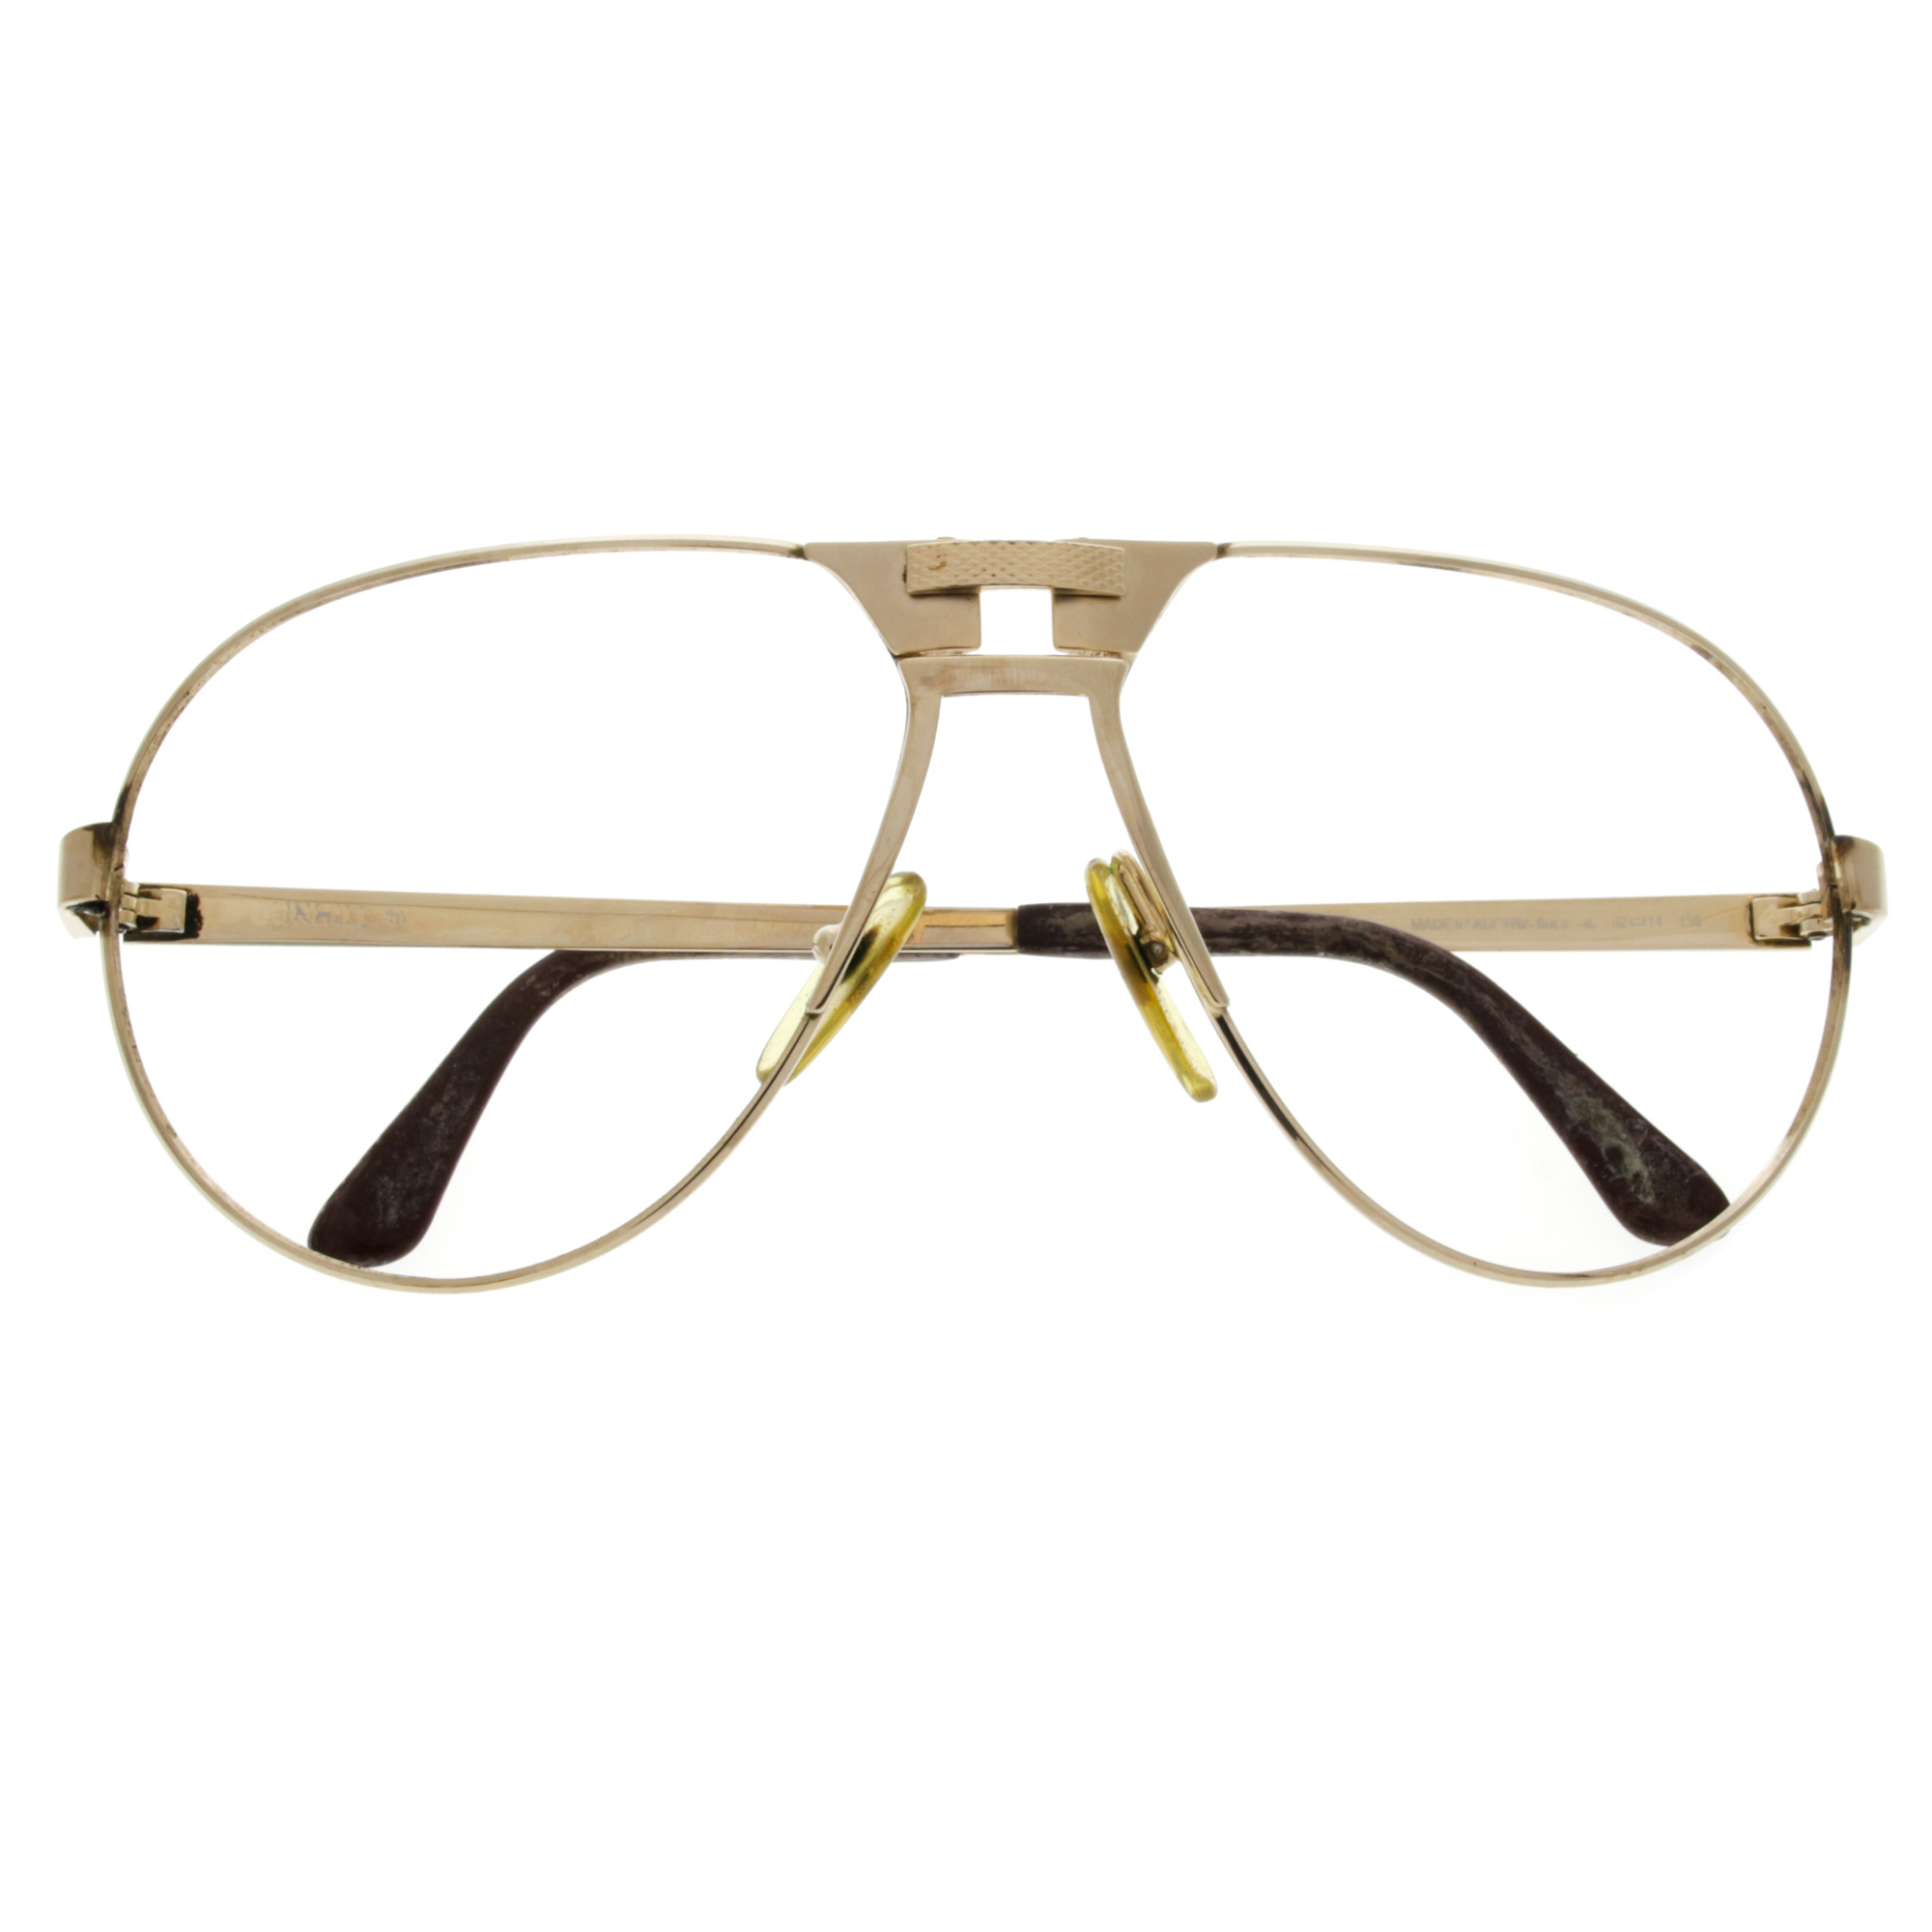 1980S Vintage Dunhill Aviator Glasses Frame 6083 eBay